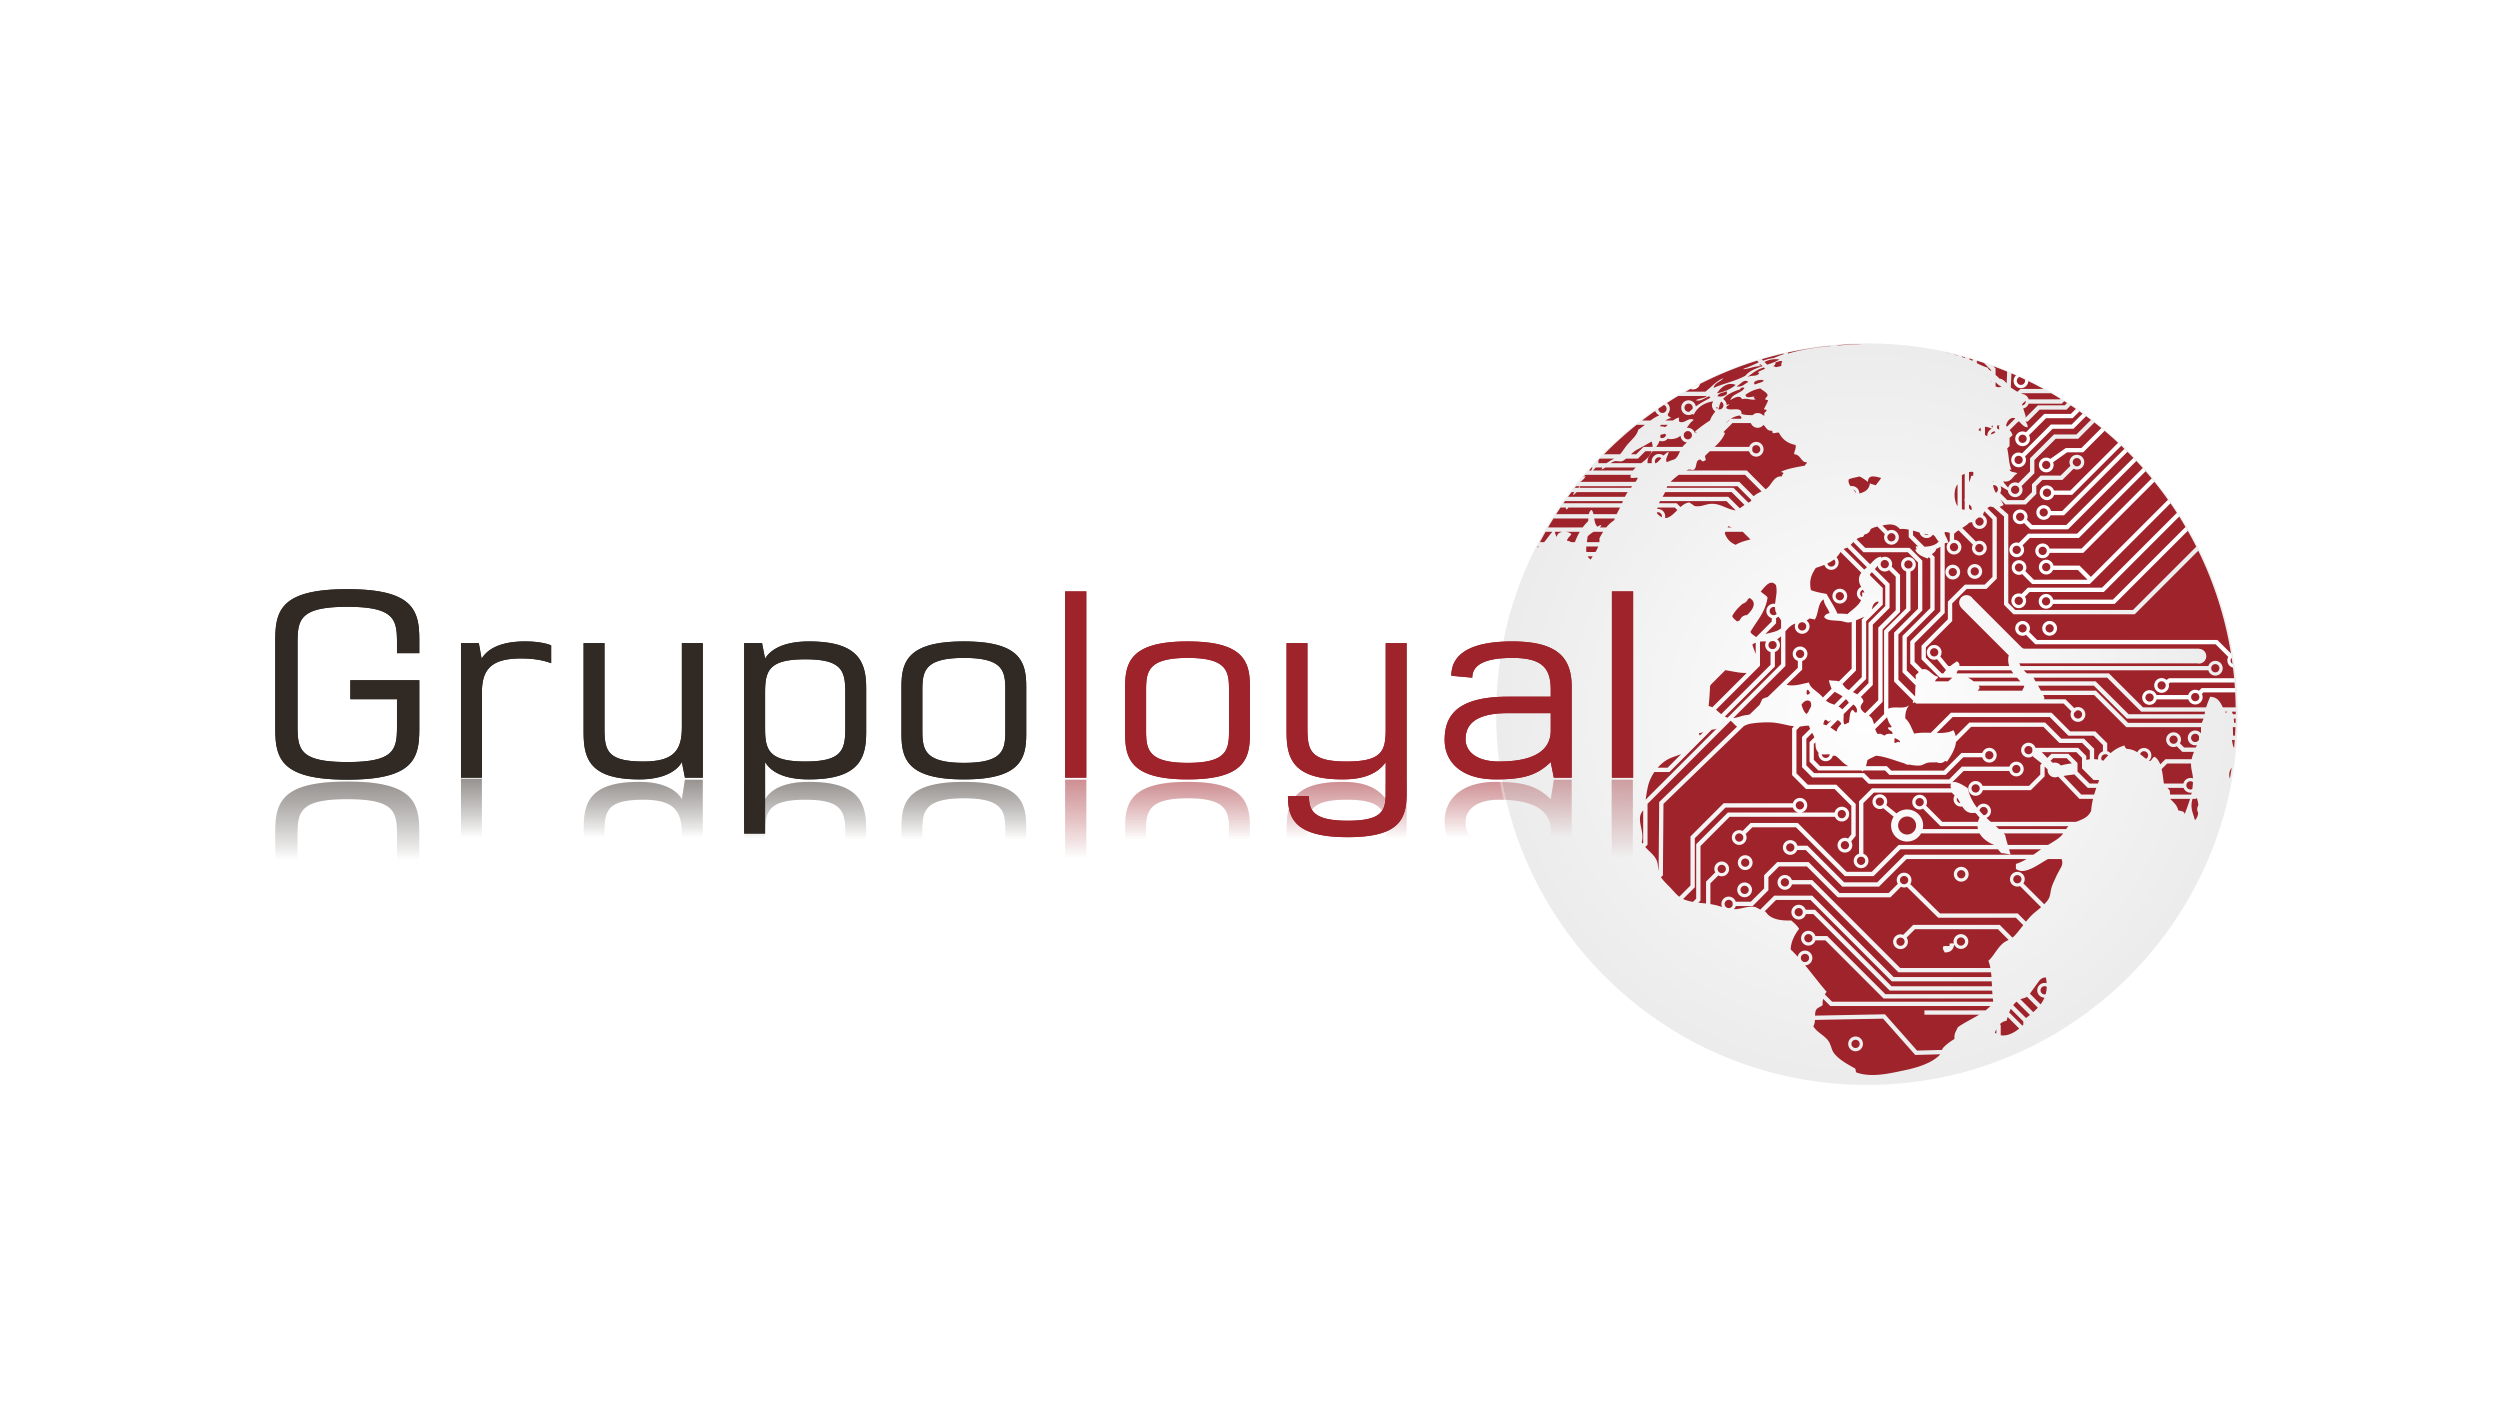 Grupo-Loyal-logo